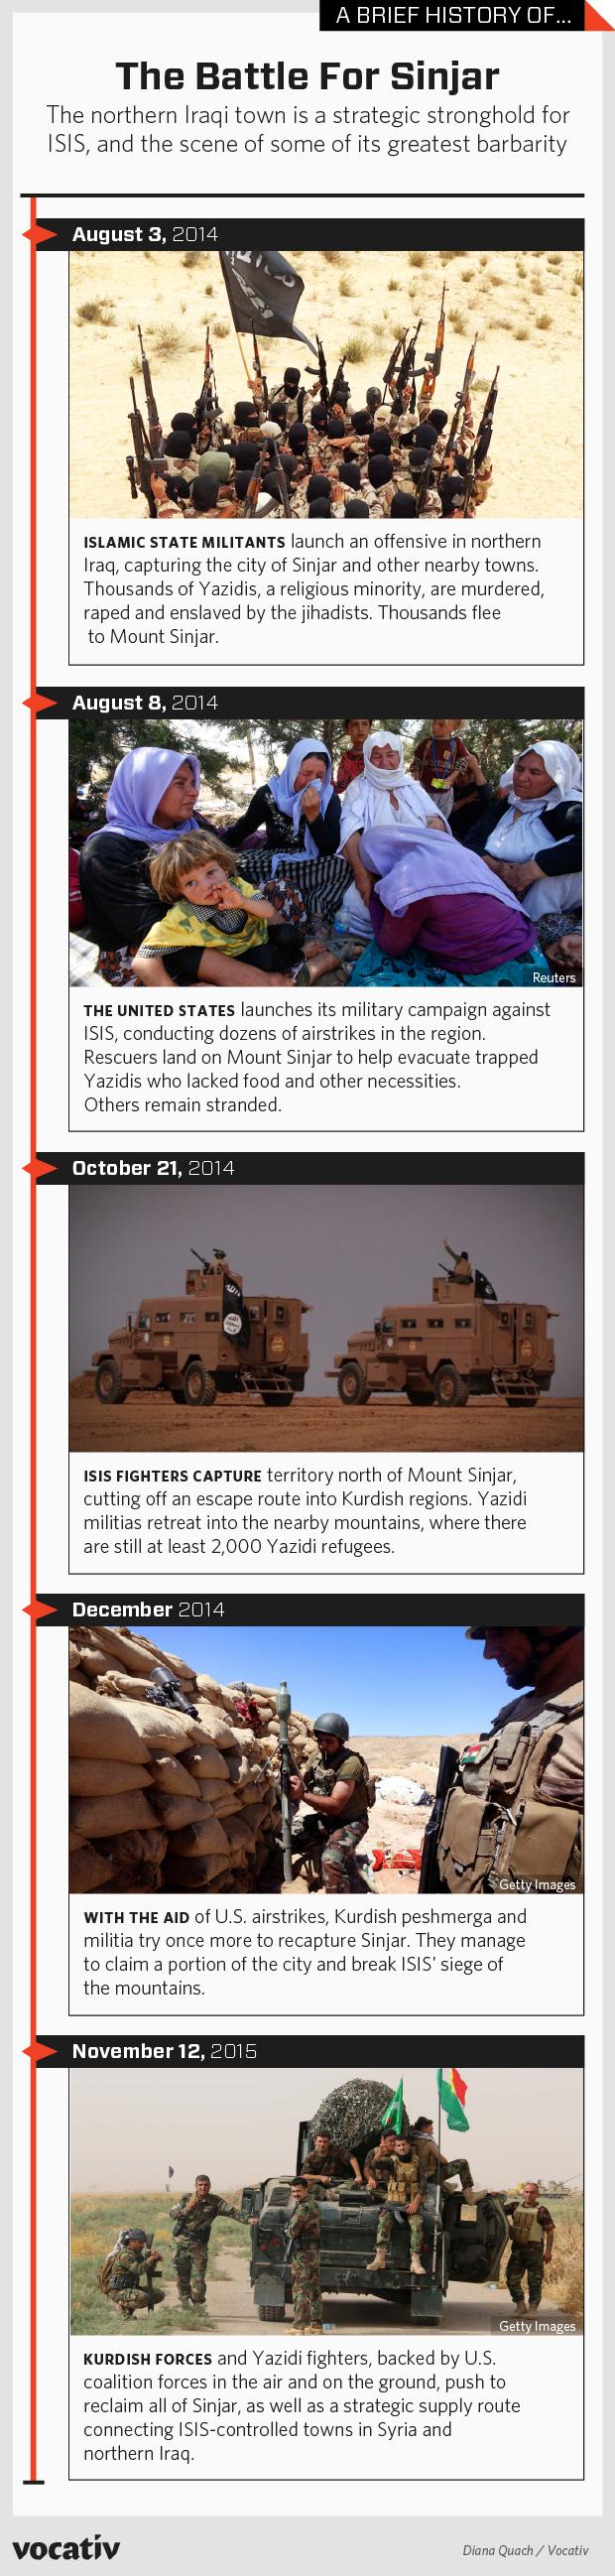 2015_11_12 Battle Sinjar BHO